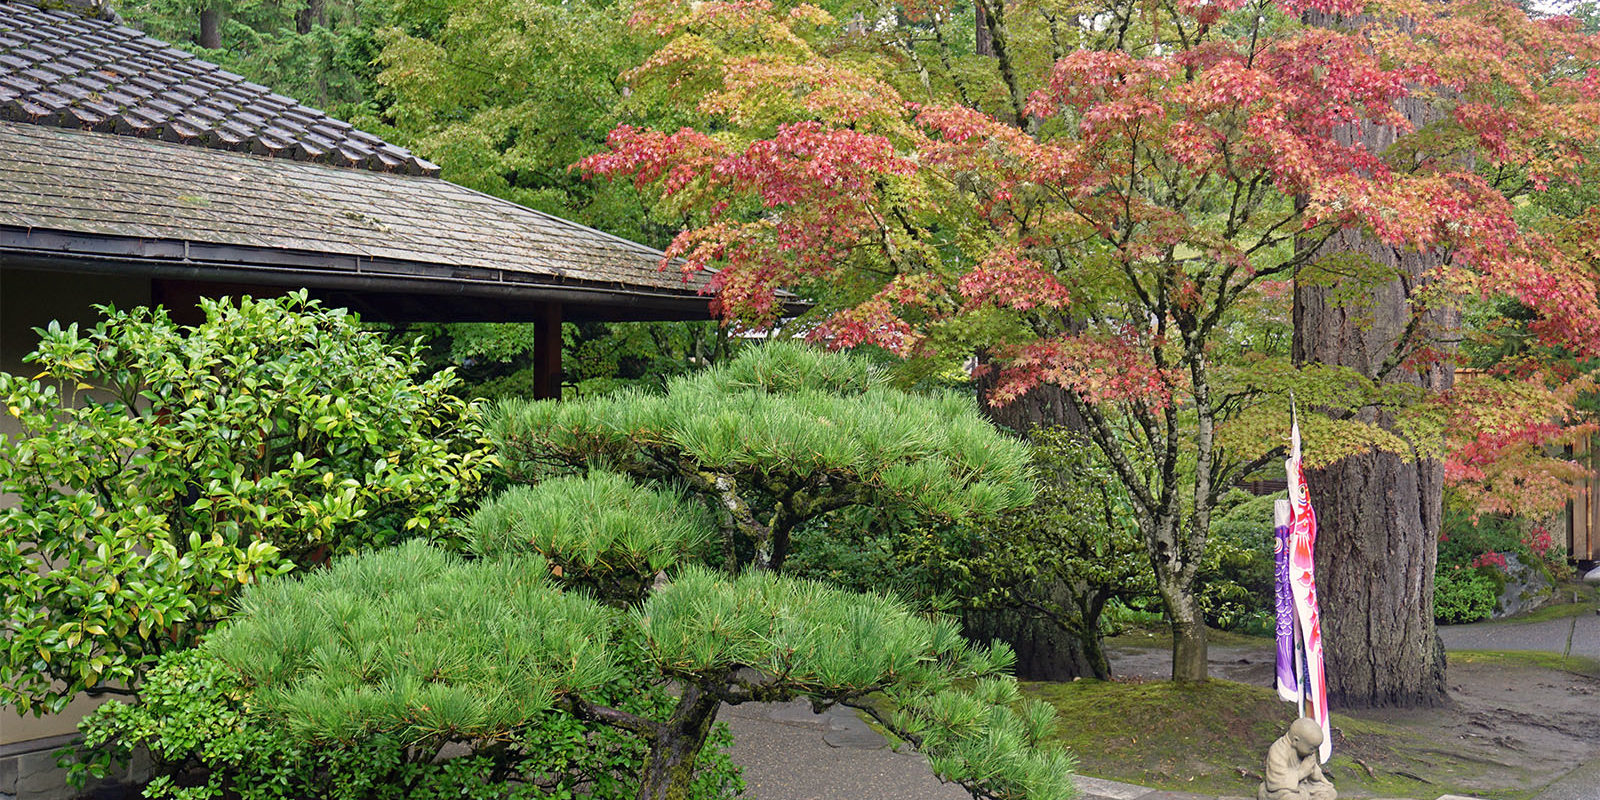 Portland Japanese Garden Early Fall Colors by Tyler Quinn - 2018-10-09 - DSC00965_low